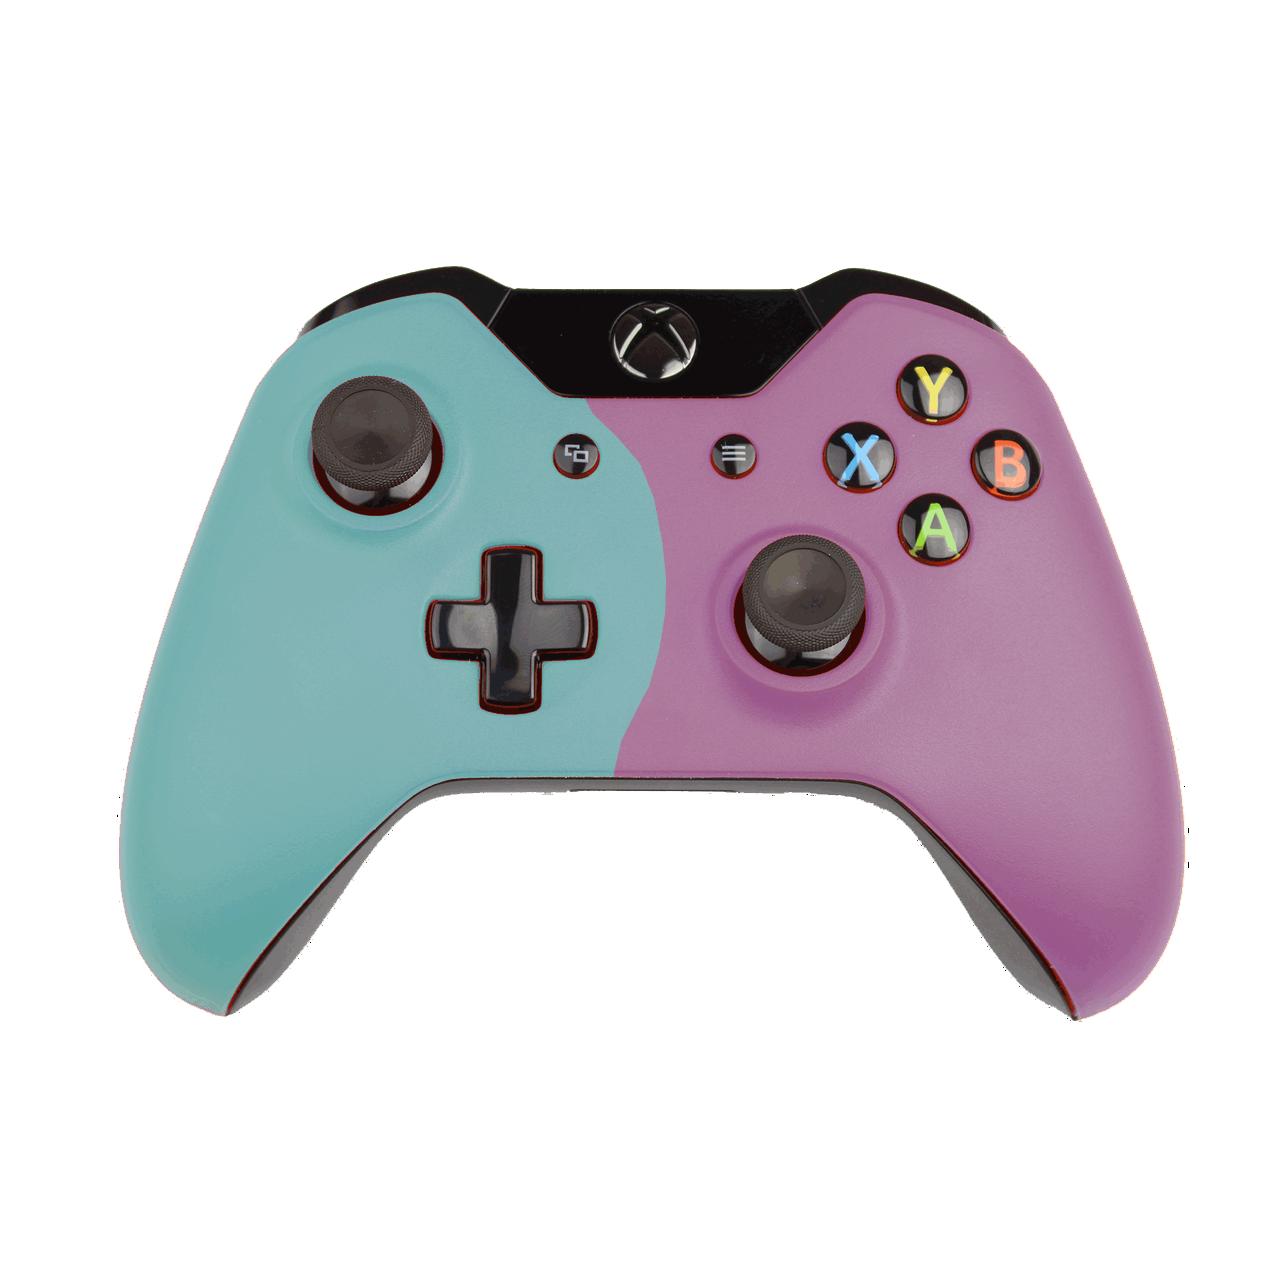 Rh Xbox Rhino Controllers Xbox One Controller Custom Xbox One Controller Custom Xbox